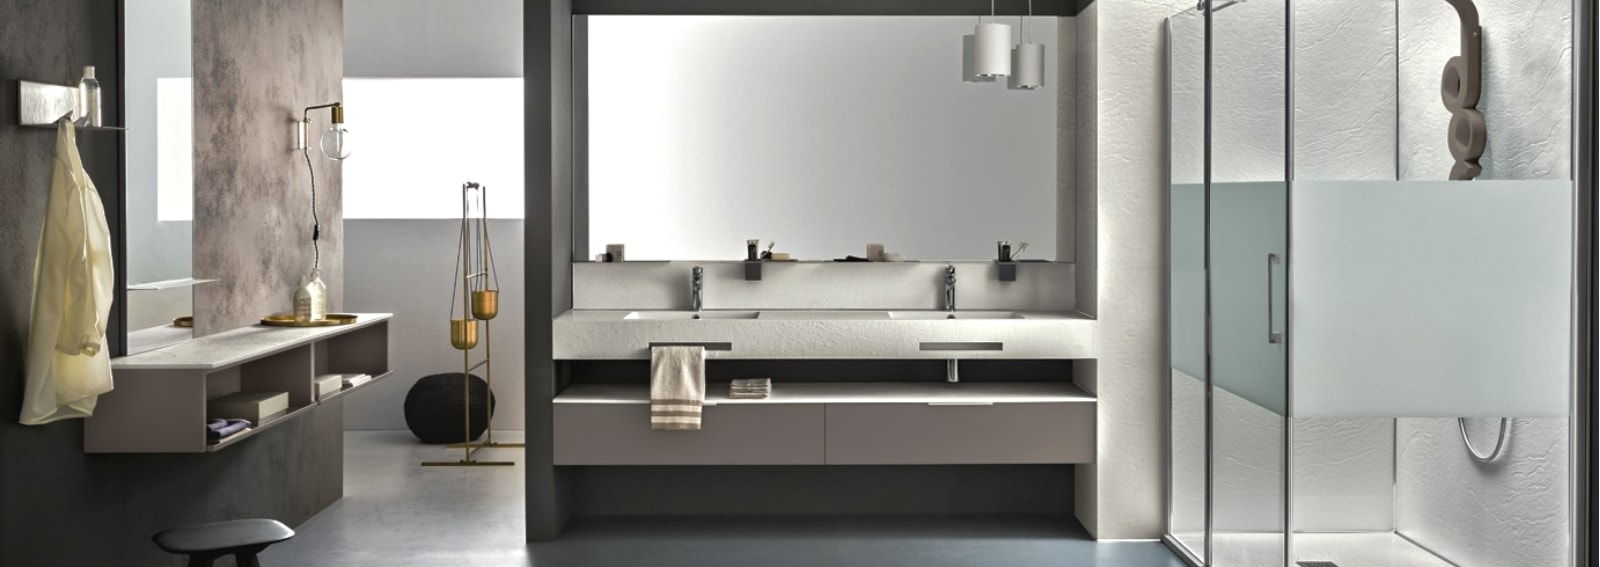 Bagno moderno Desktop